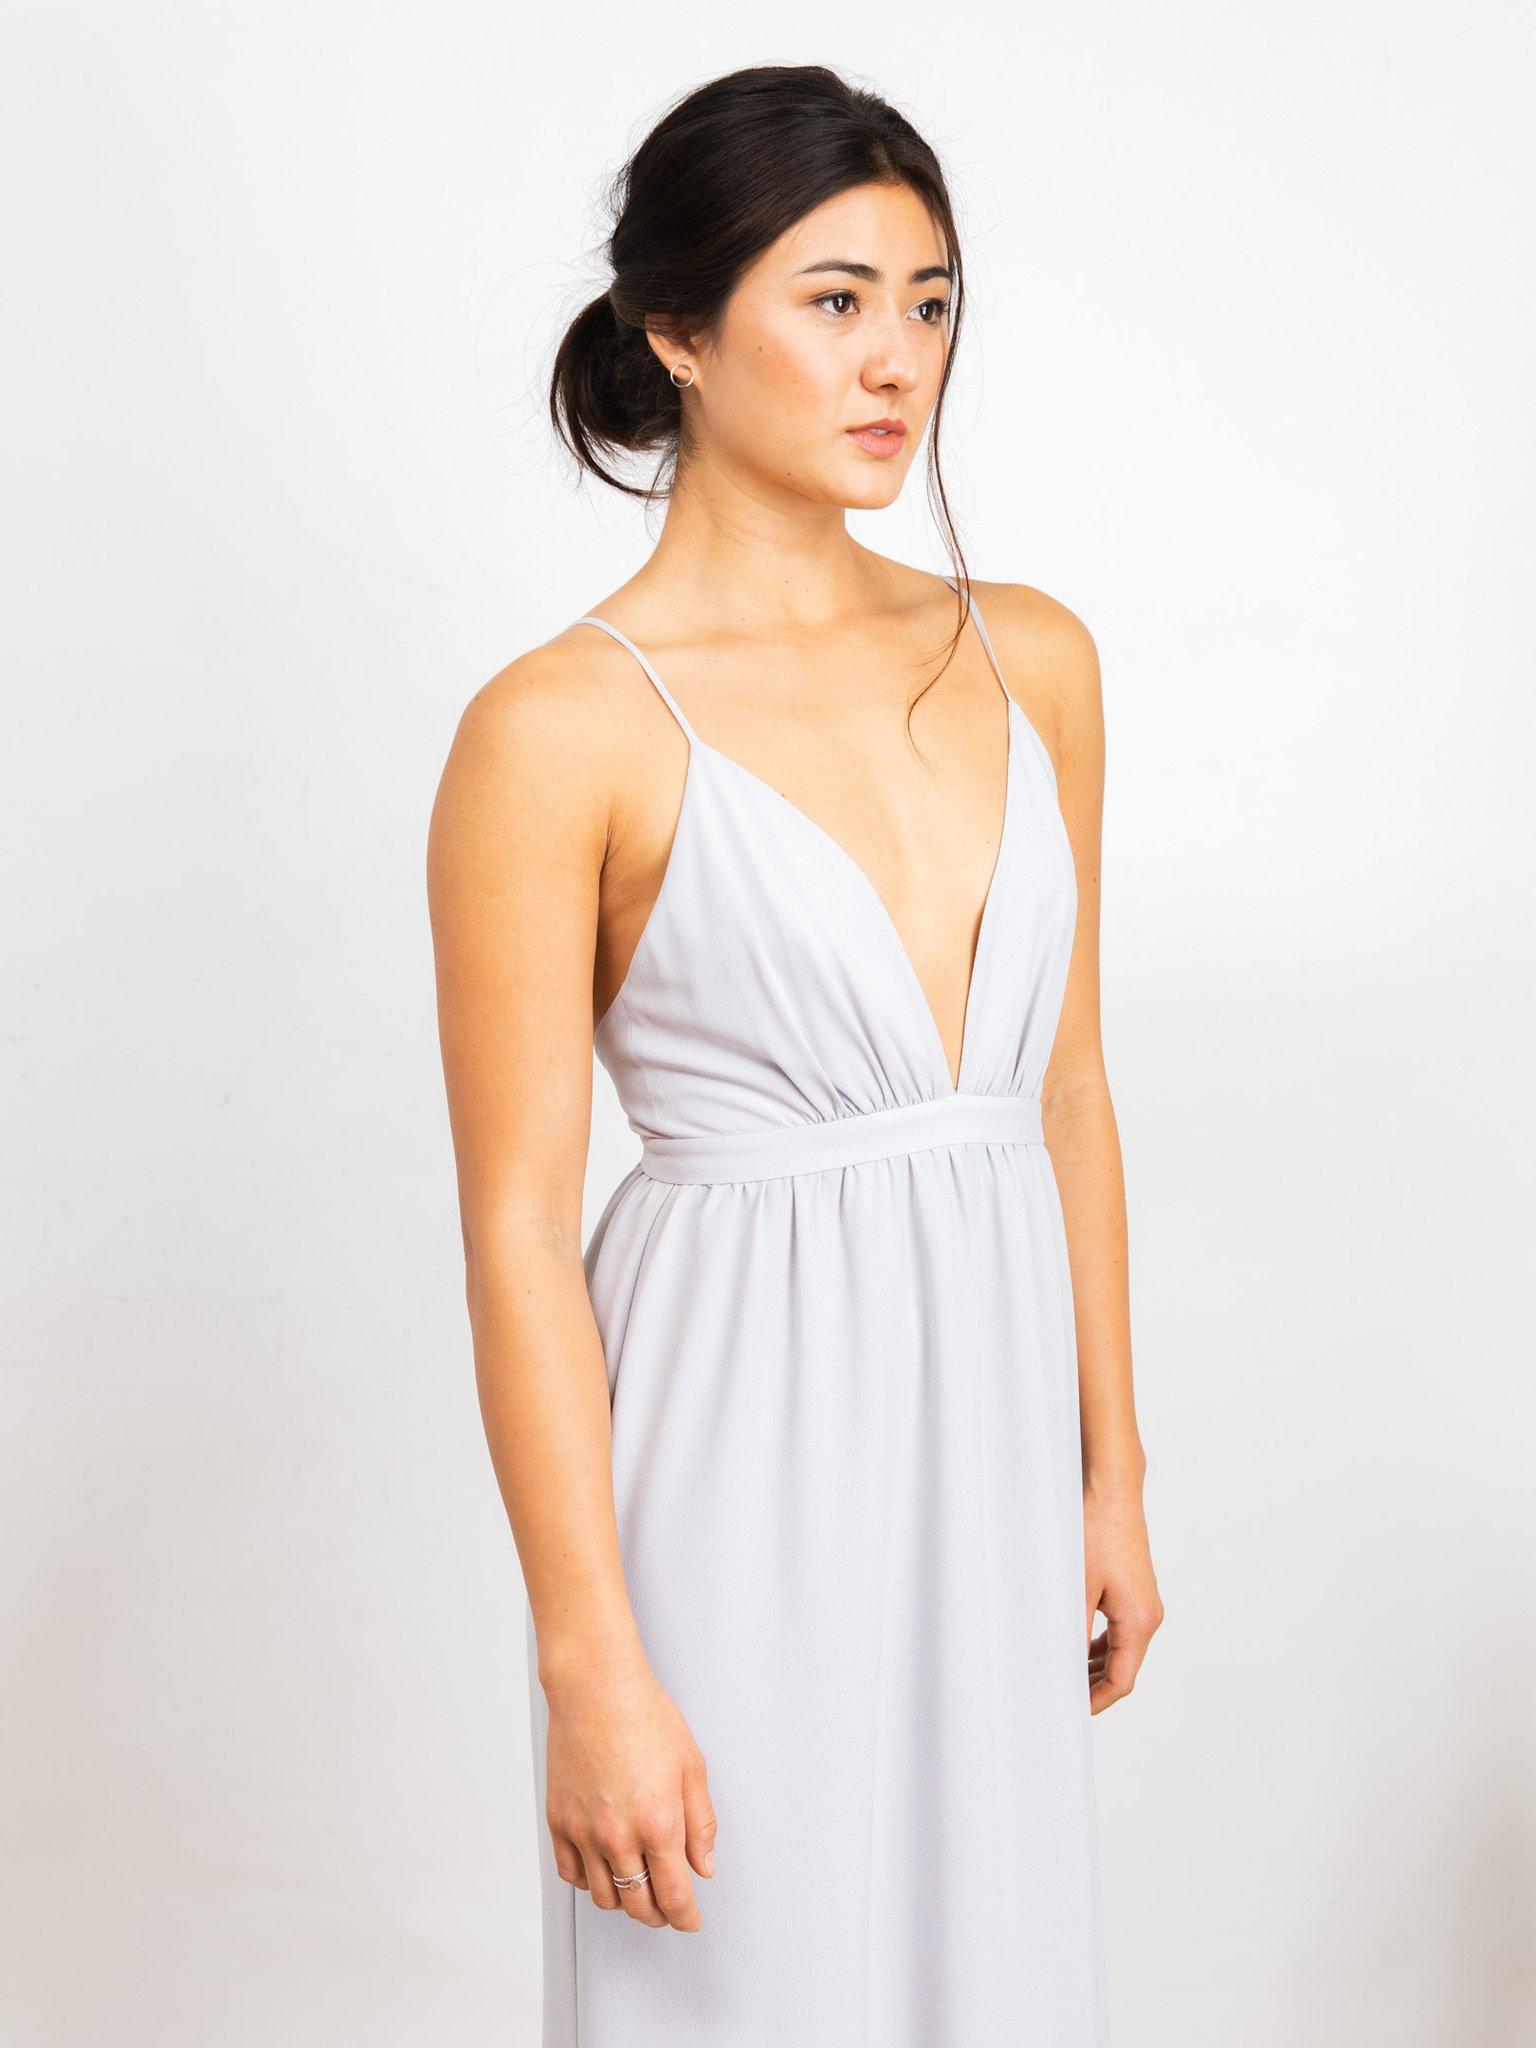 1004_-_Trinity_Dress_-_181021-PF_Ecomm-032_1024x1024@2x.jpg